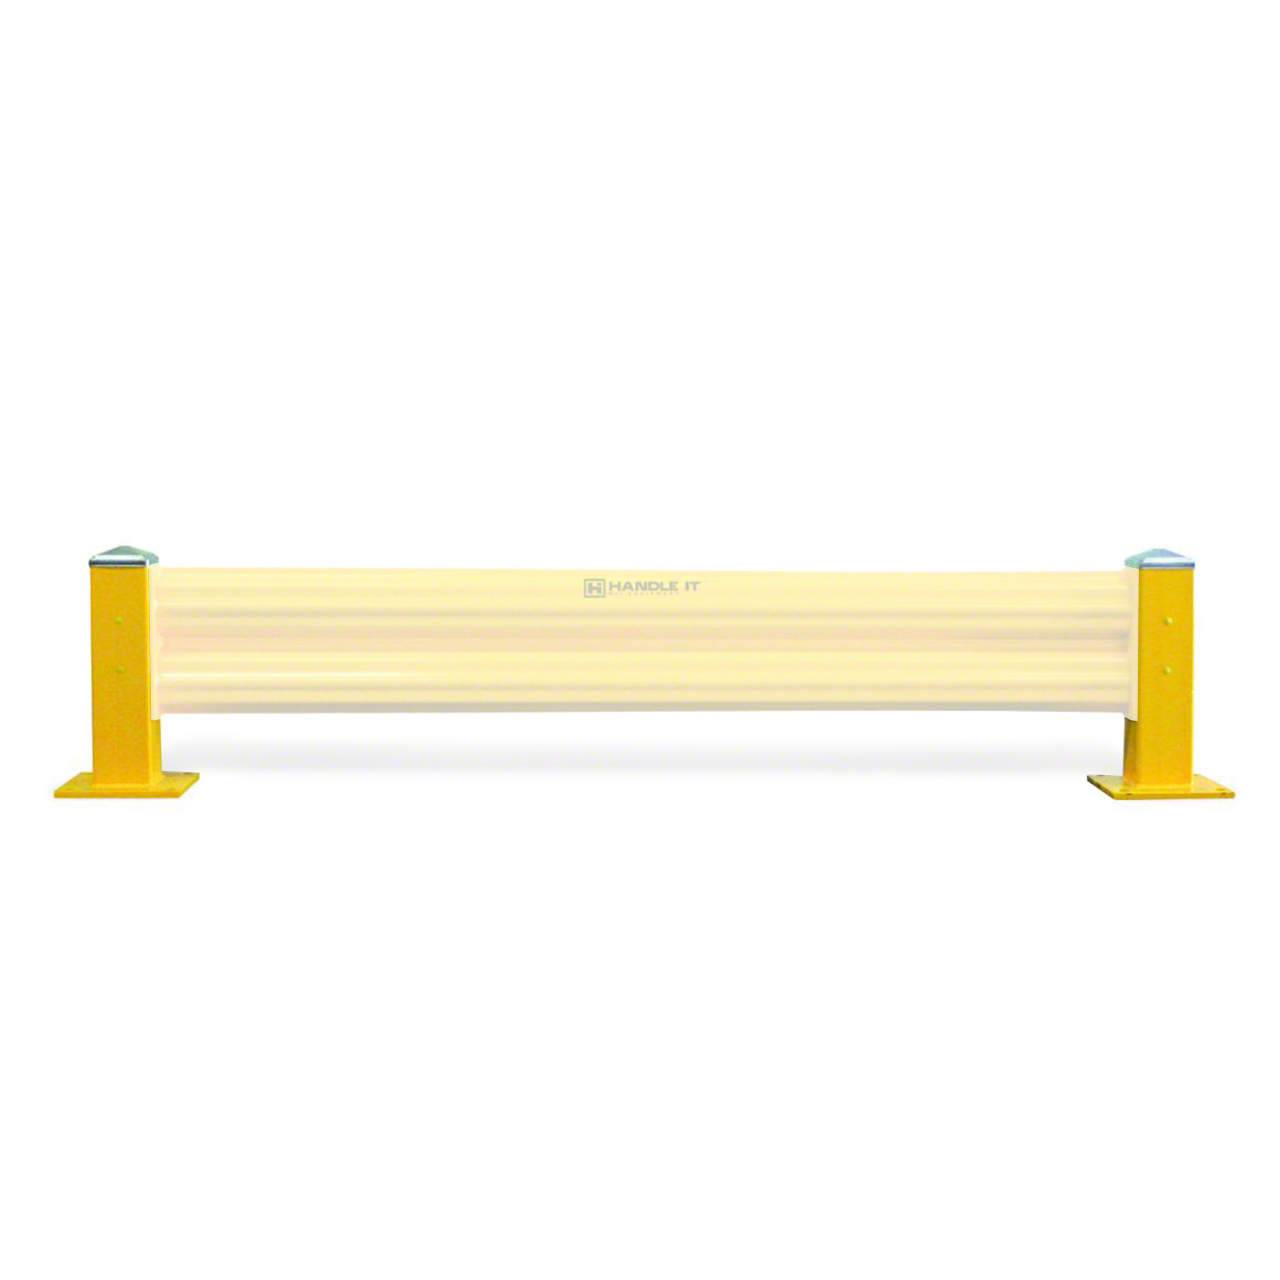 "18"" column height for single rail setup"